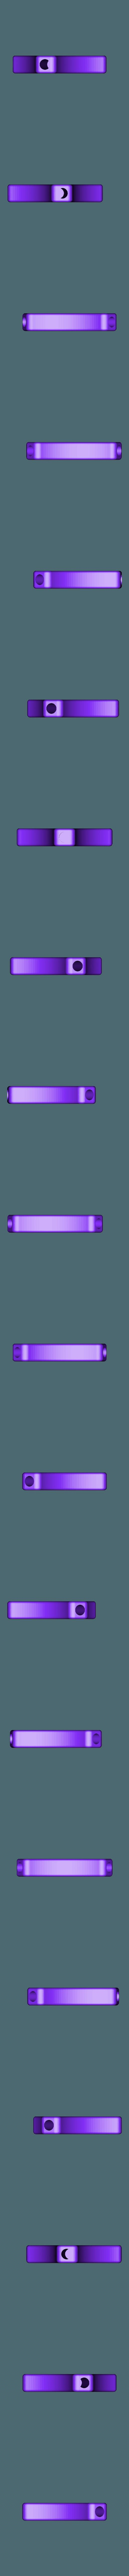 ROTOR.stl Download free STL file COLUMN DRILL • Design to 3D print, Pipapelaa